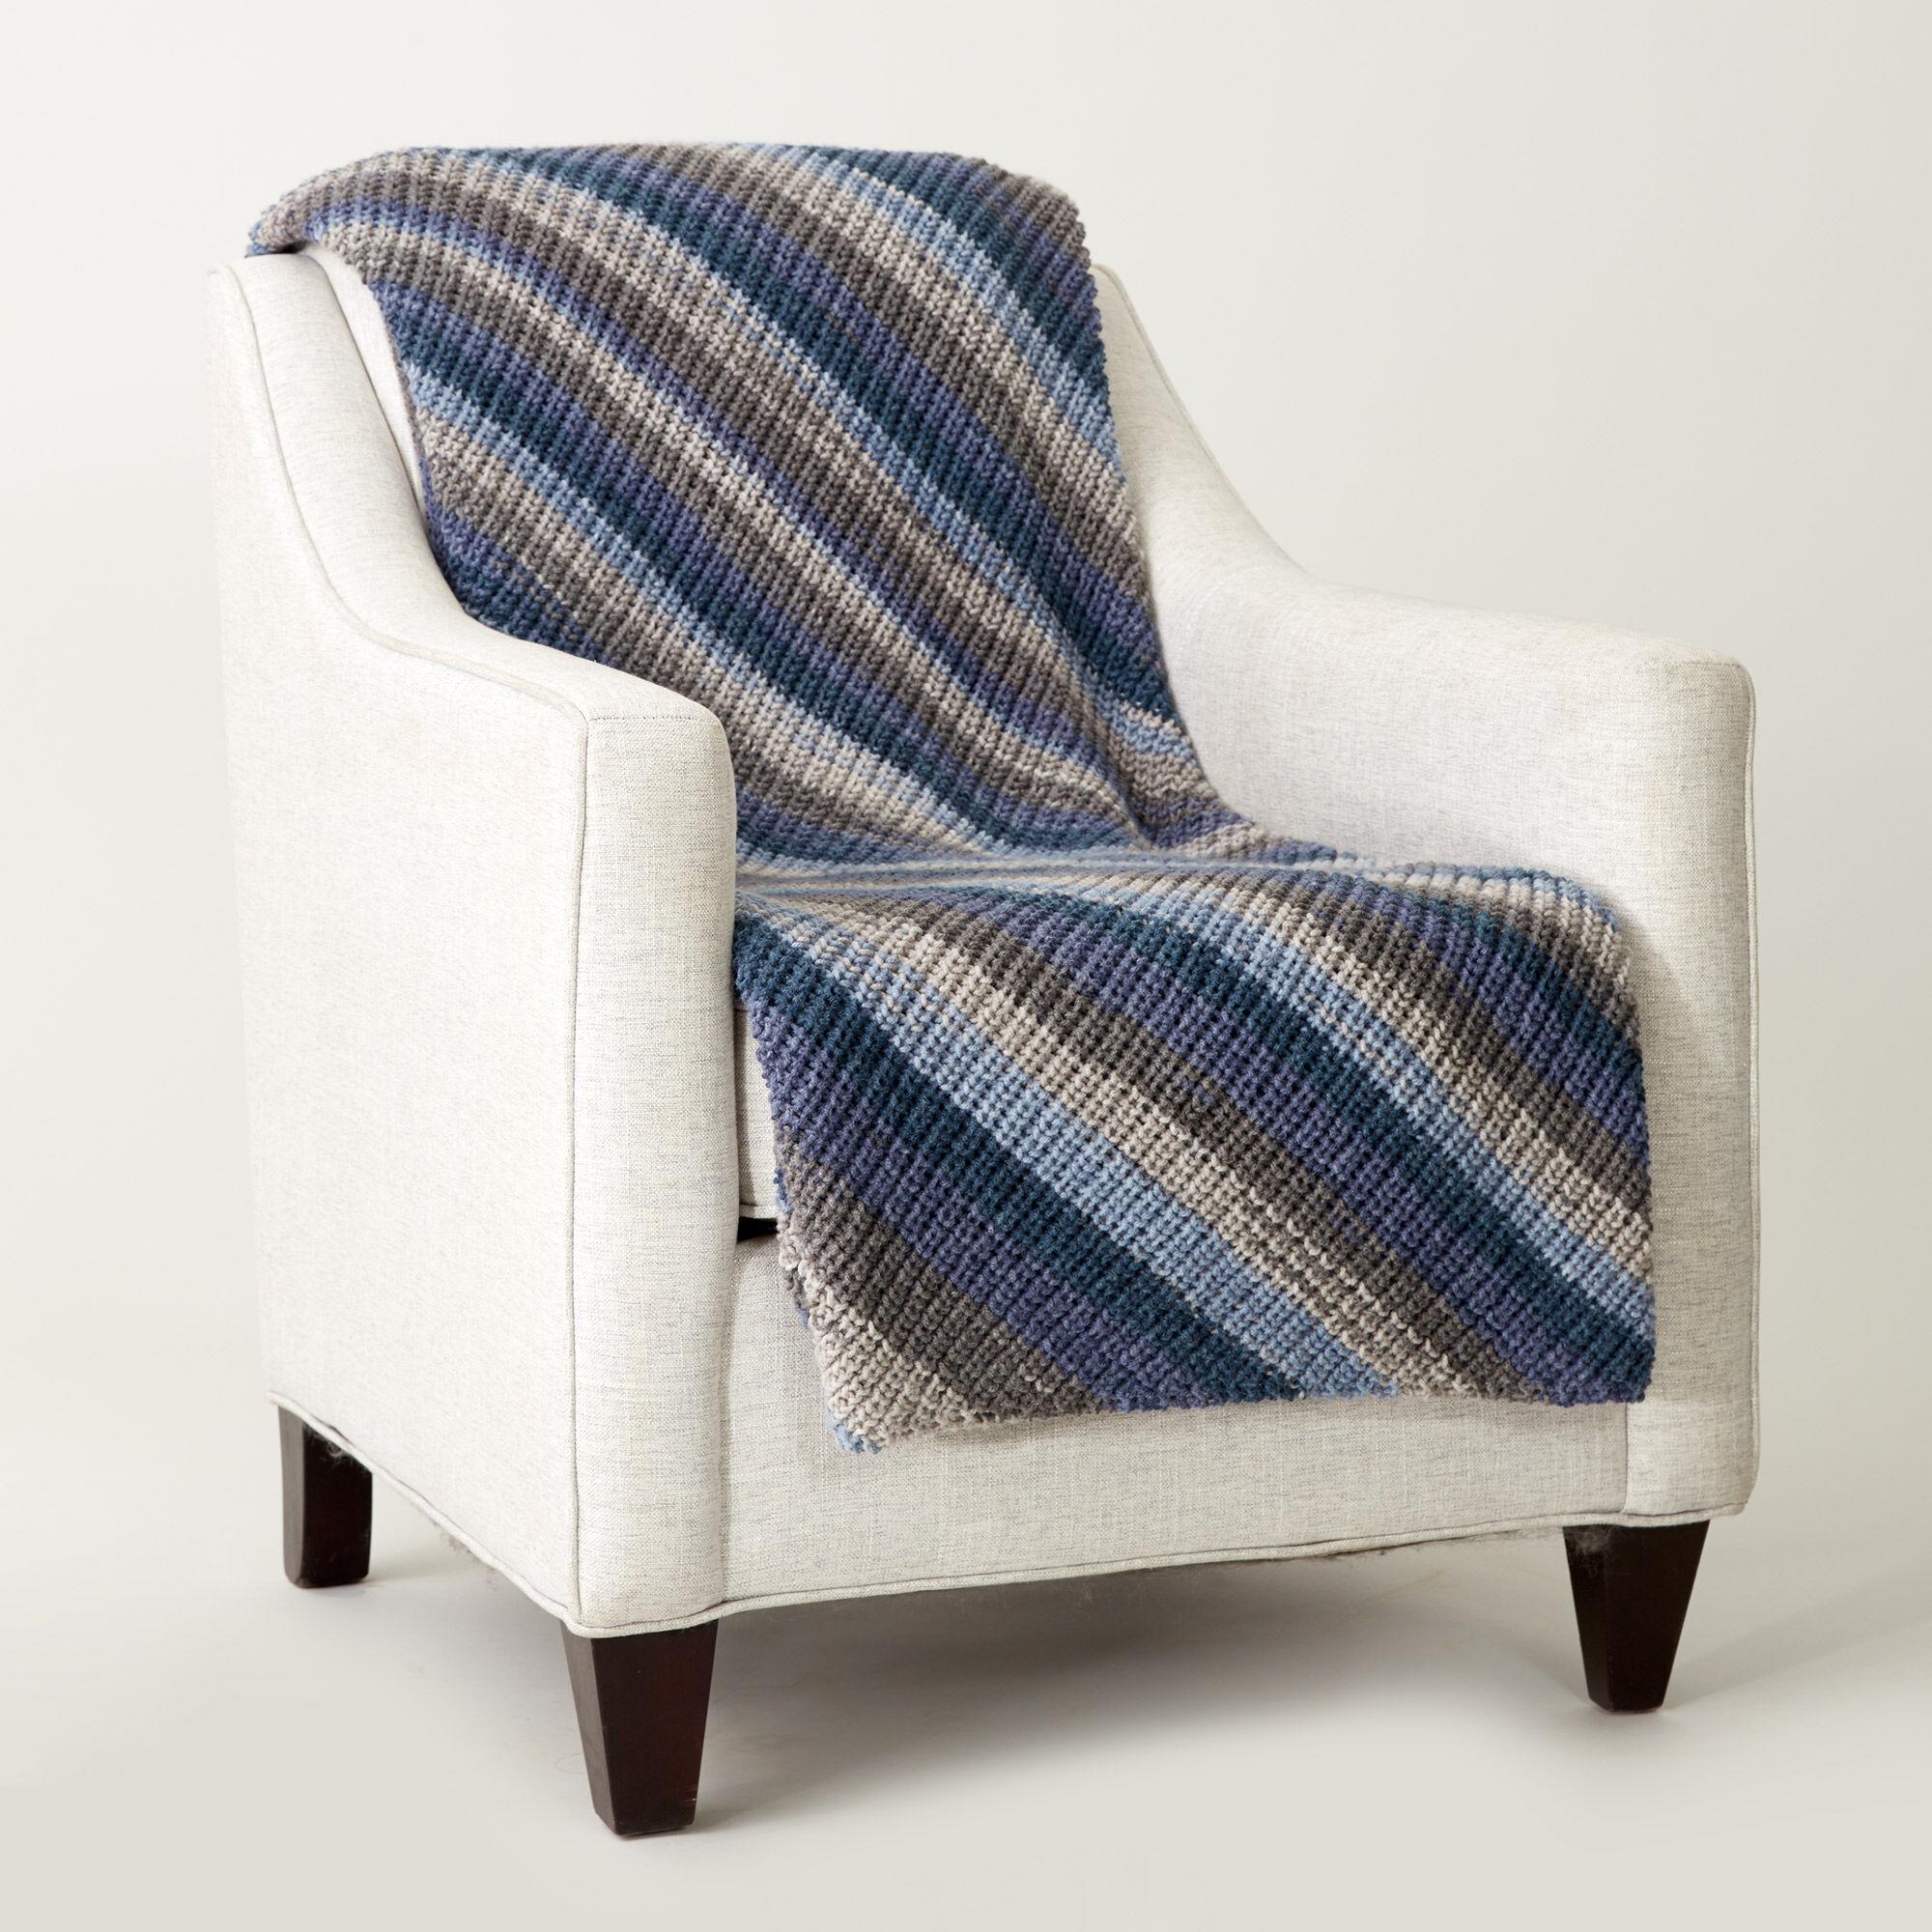 Caron Shake It Up Knit Blanket Pattern Yarnspirations